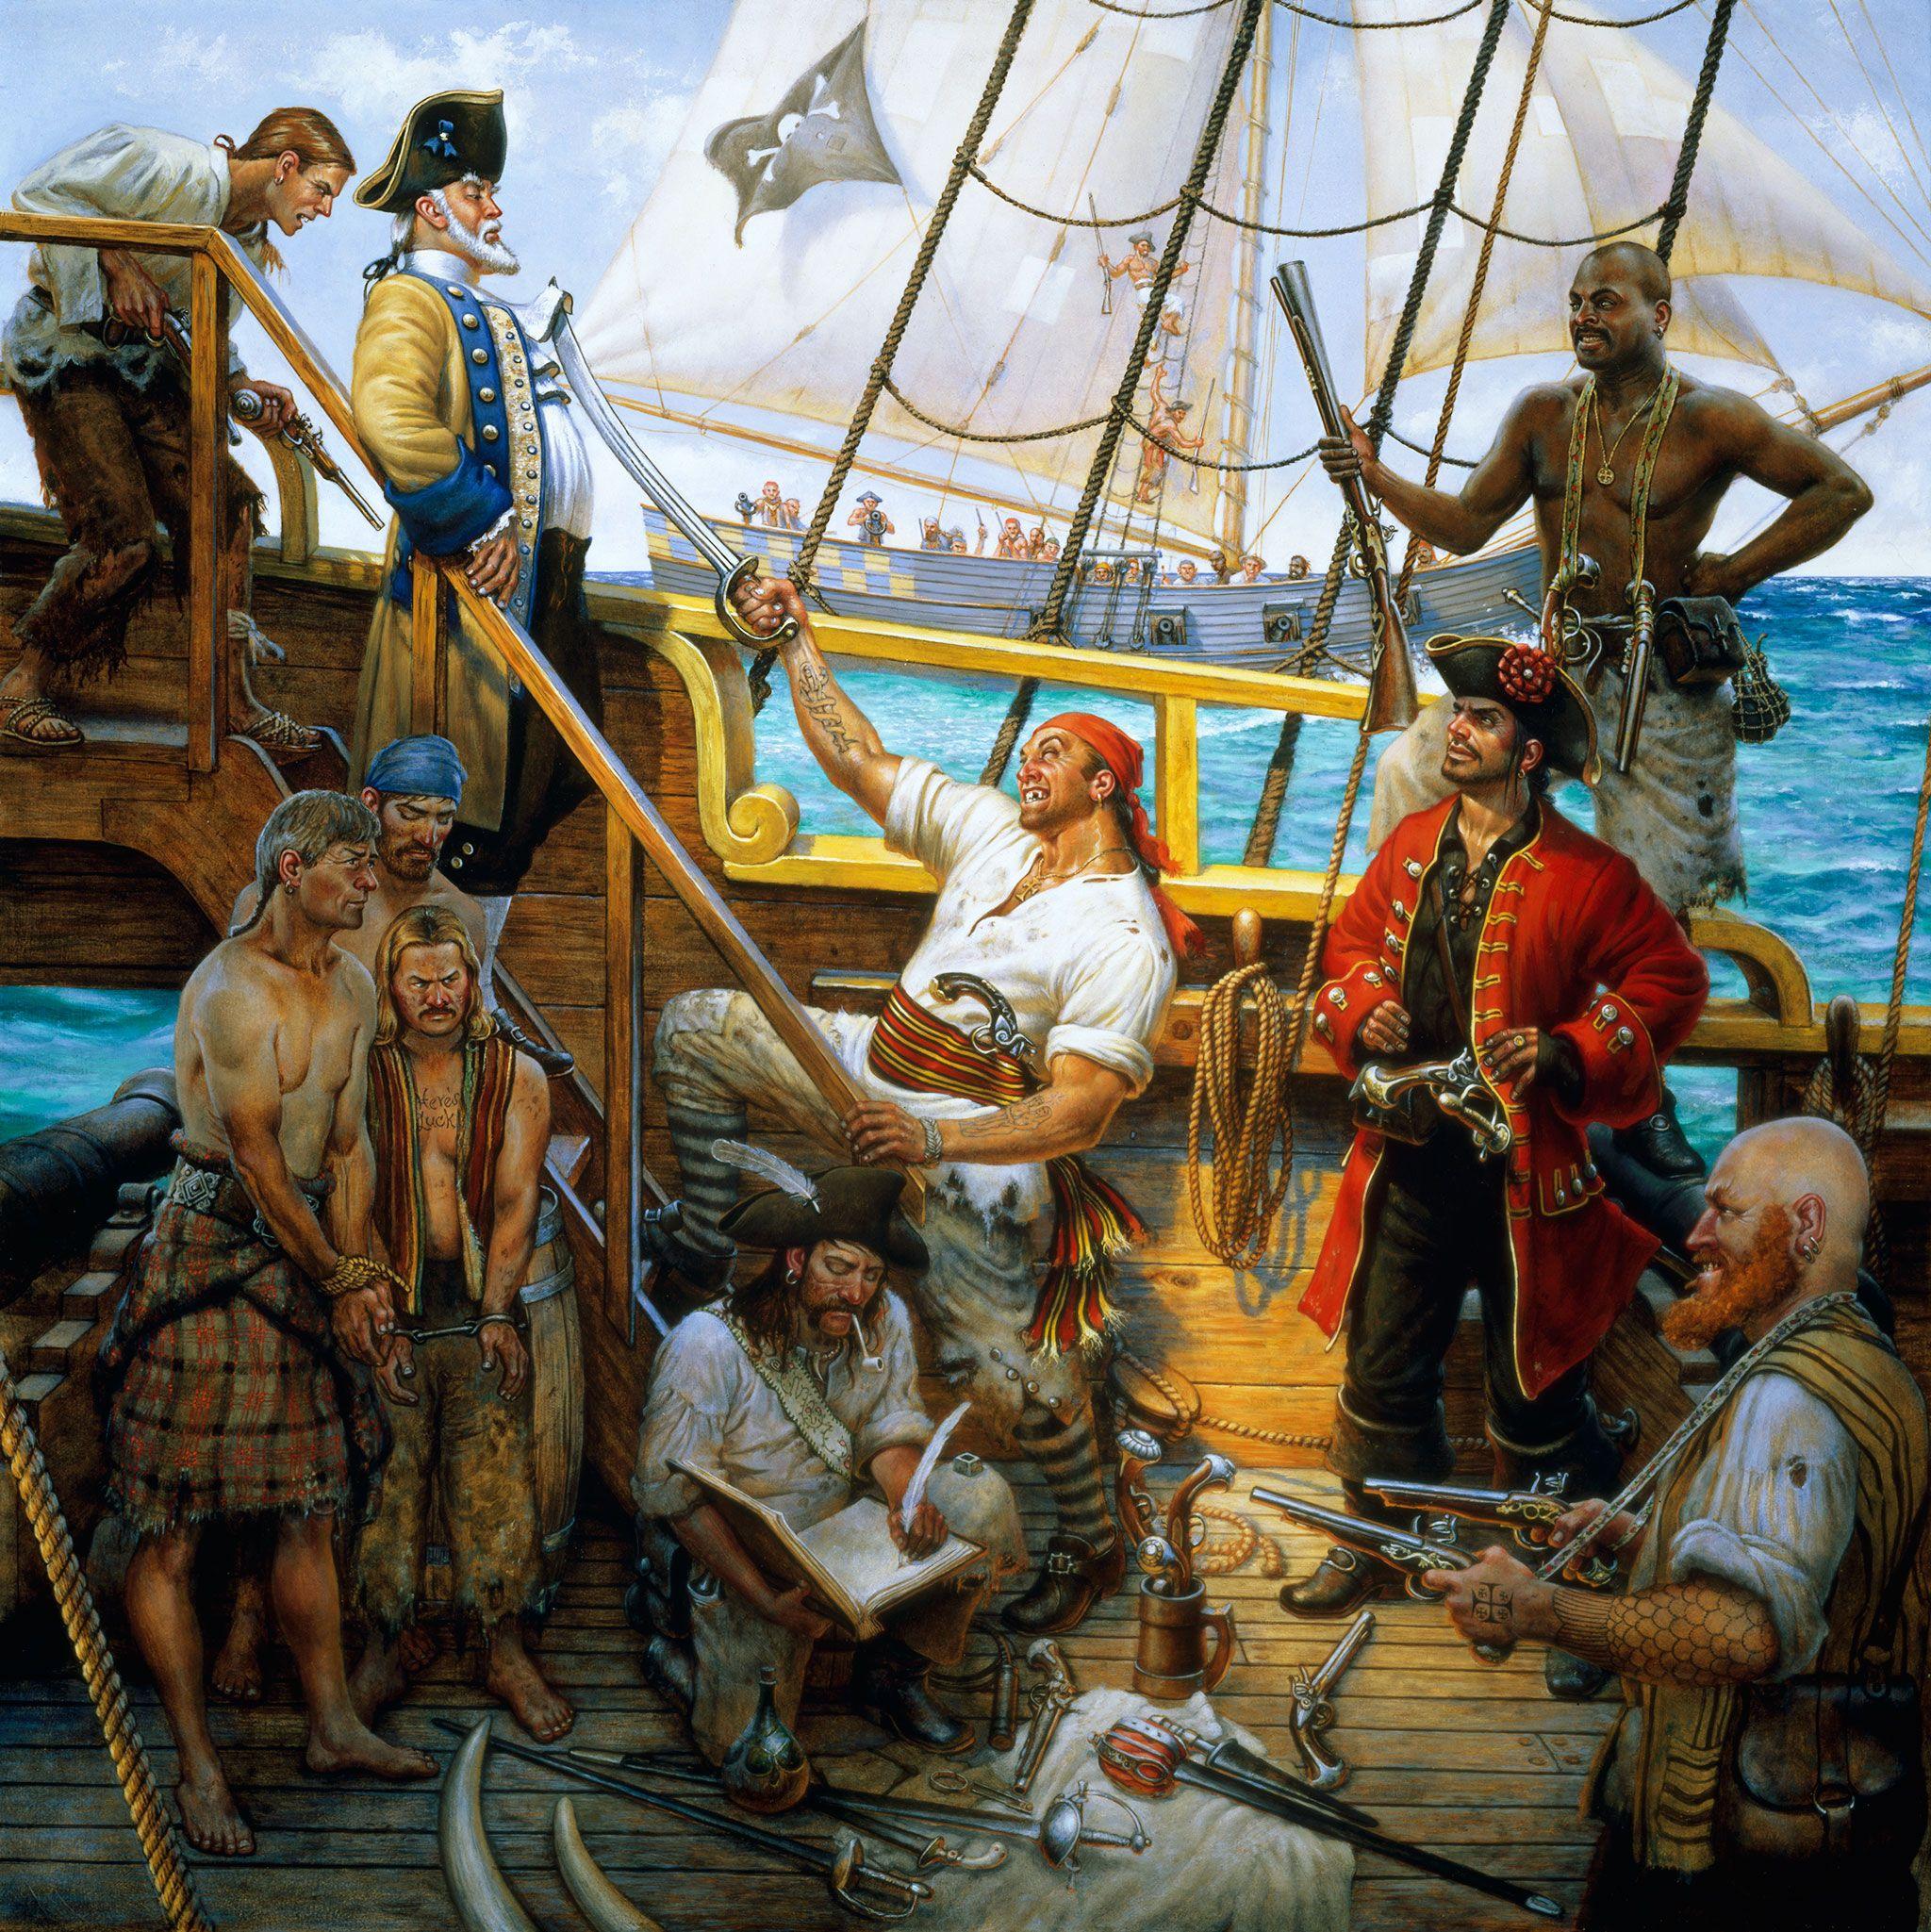 Pirates capturing a merchantship